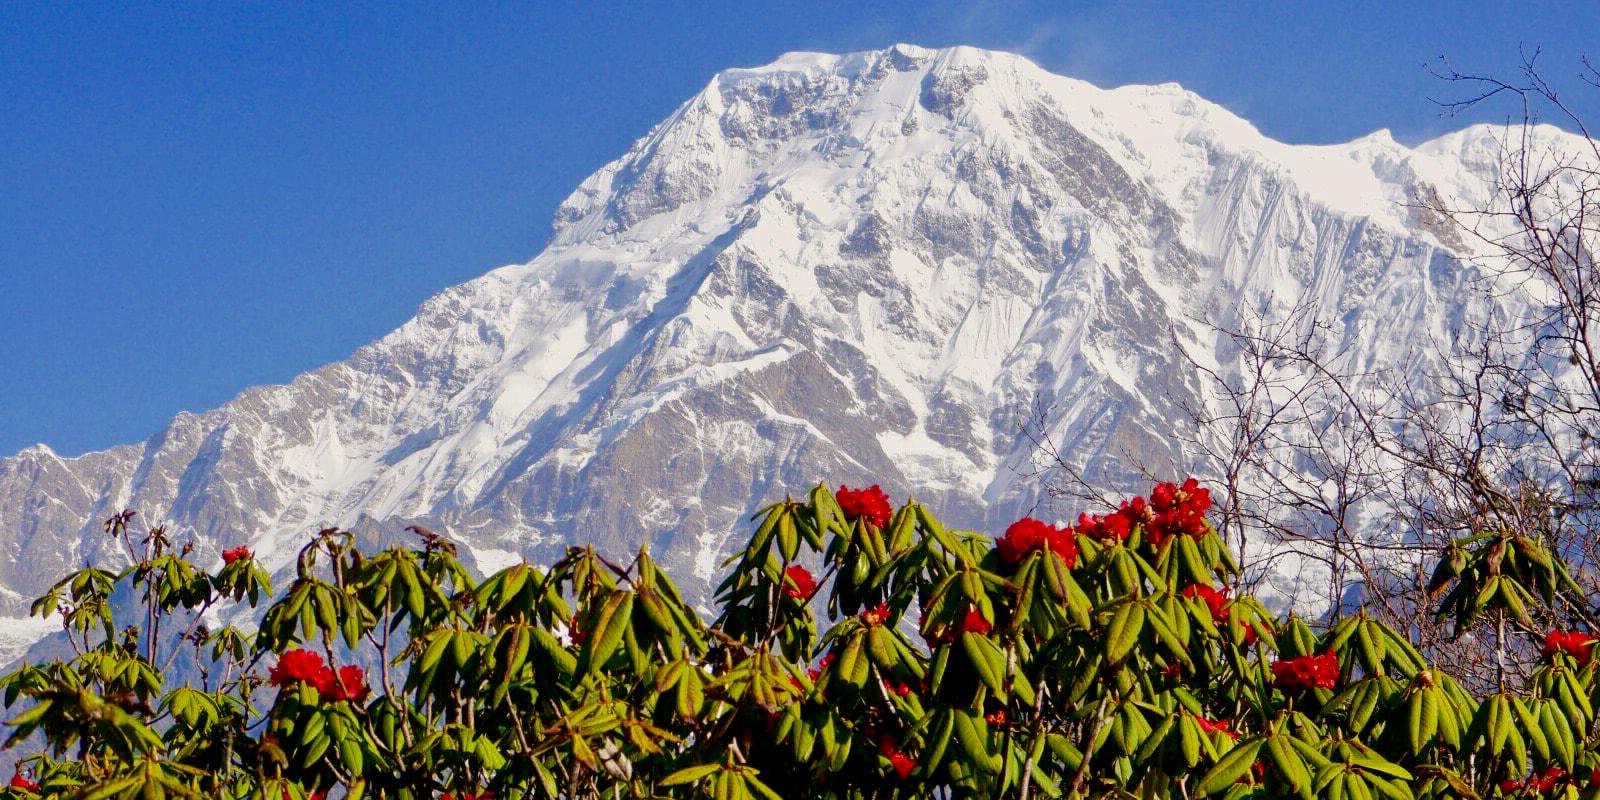 Annapurna Scenic Trail